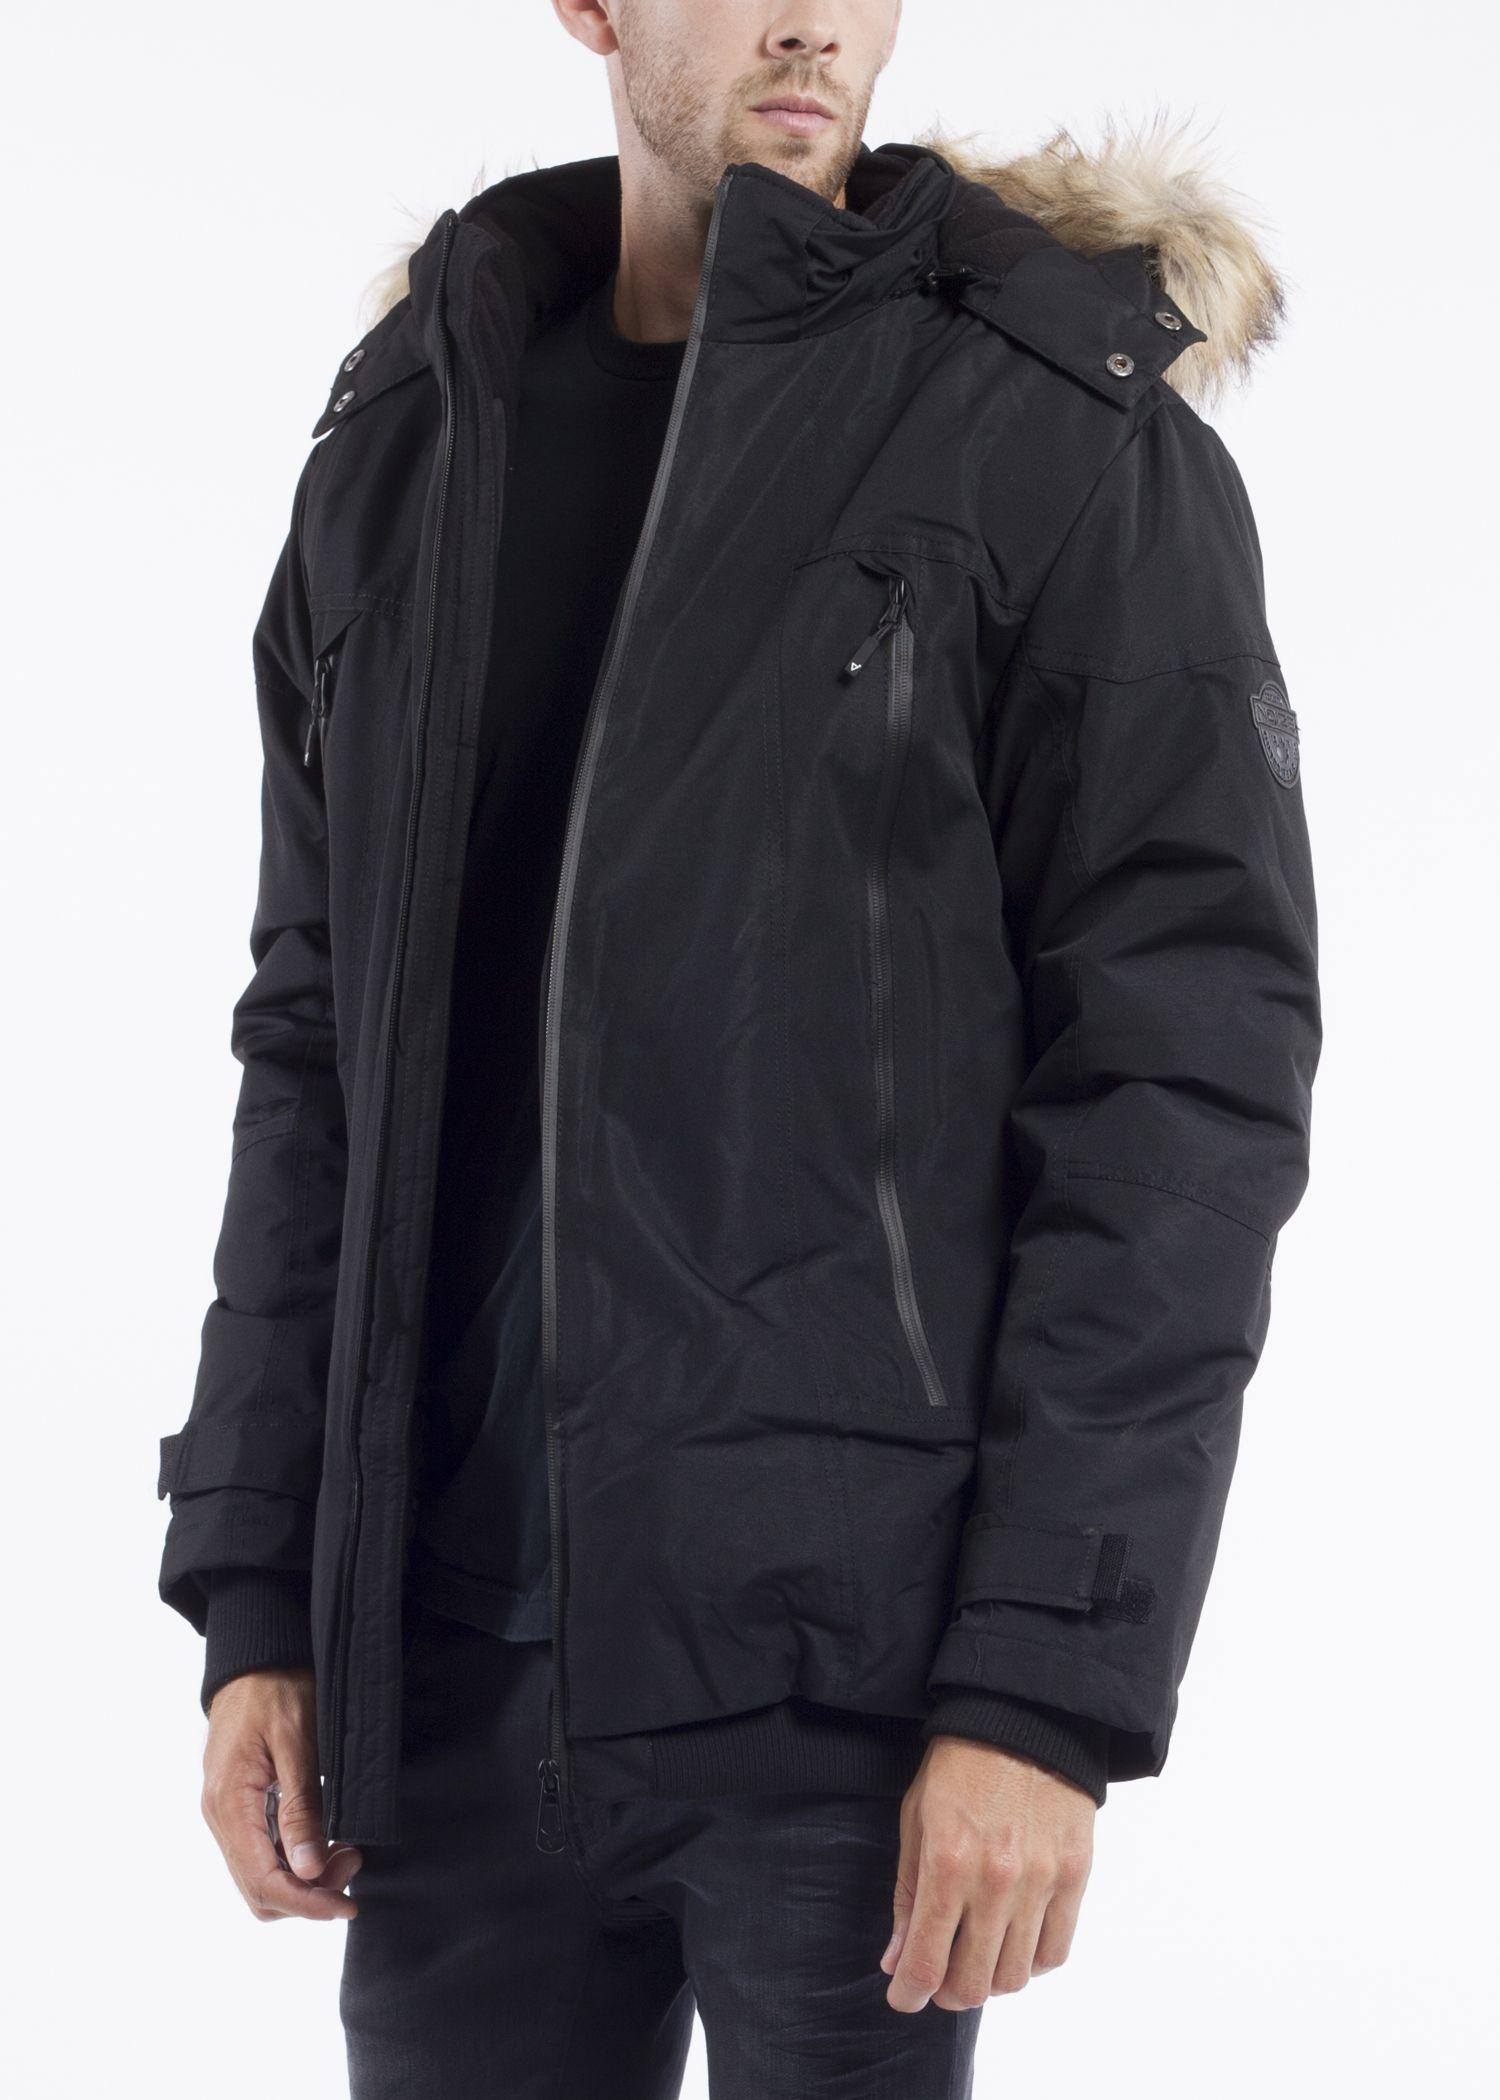 Noize Men Brad Black Winter Jackets Canada Goose Jackets Bomber Jacket [ 2100 x 1500 Pixel ]